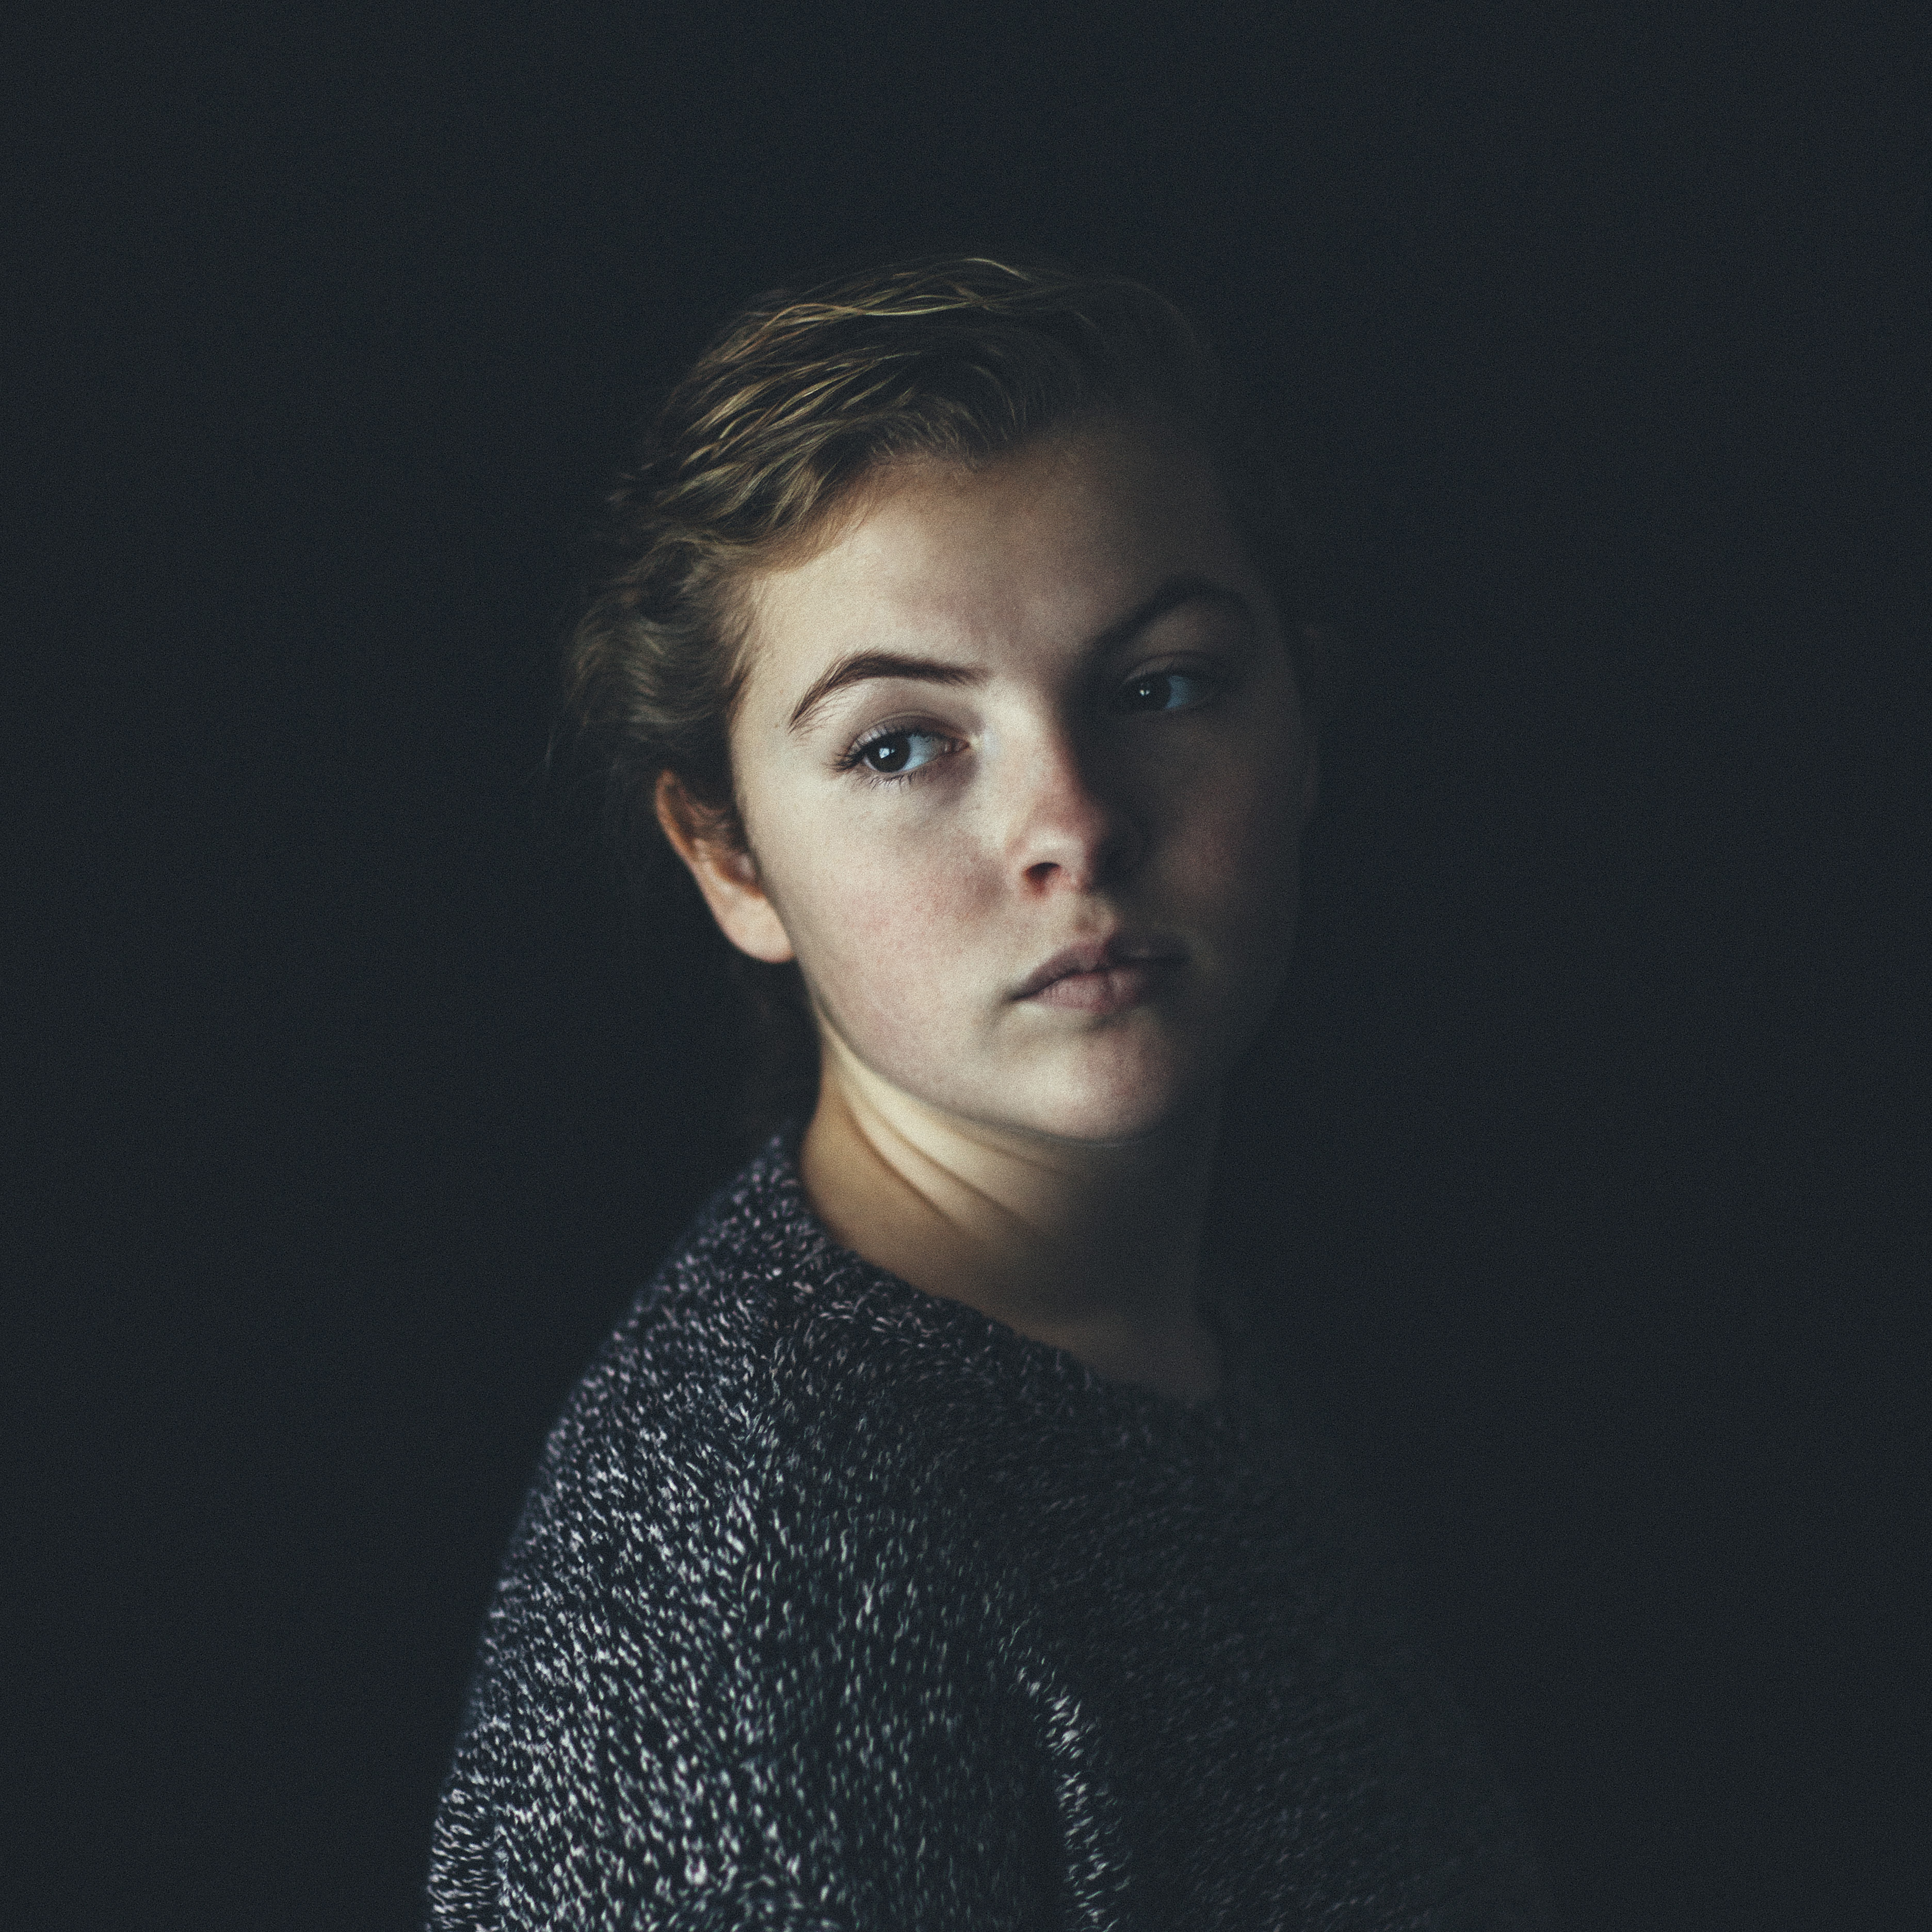 Portraiture | World Photography Organisation